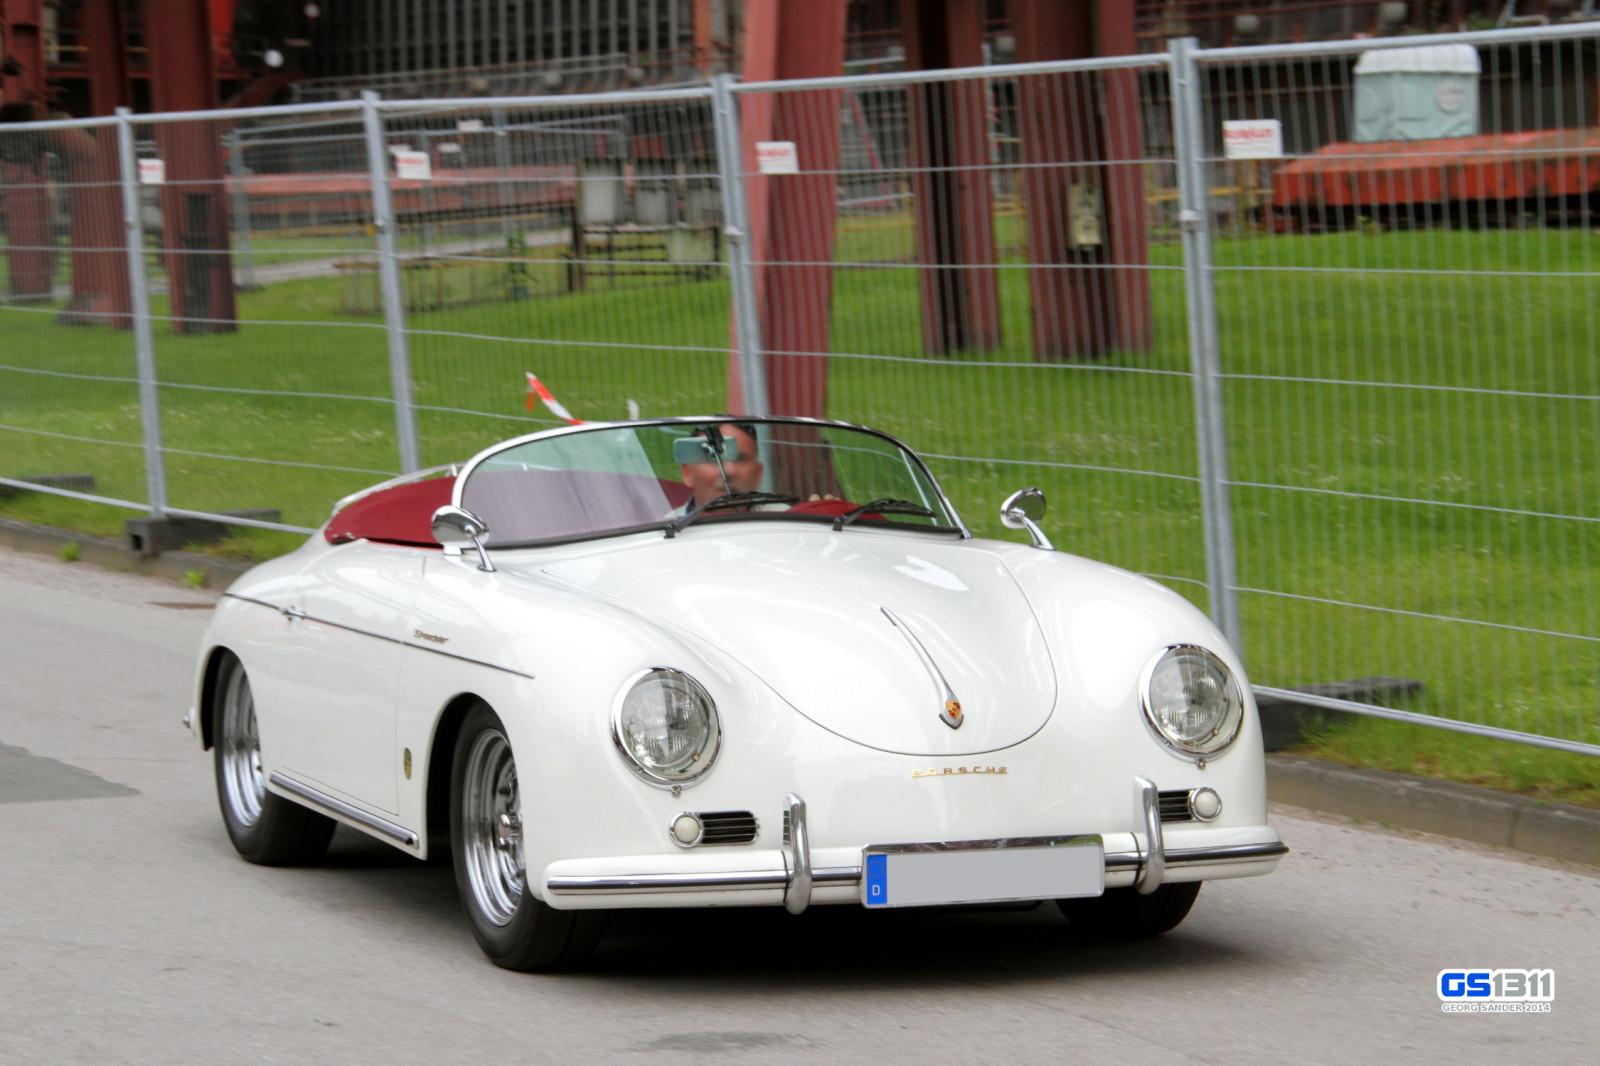 wallpaper white old volkswagen beetle sports car